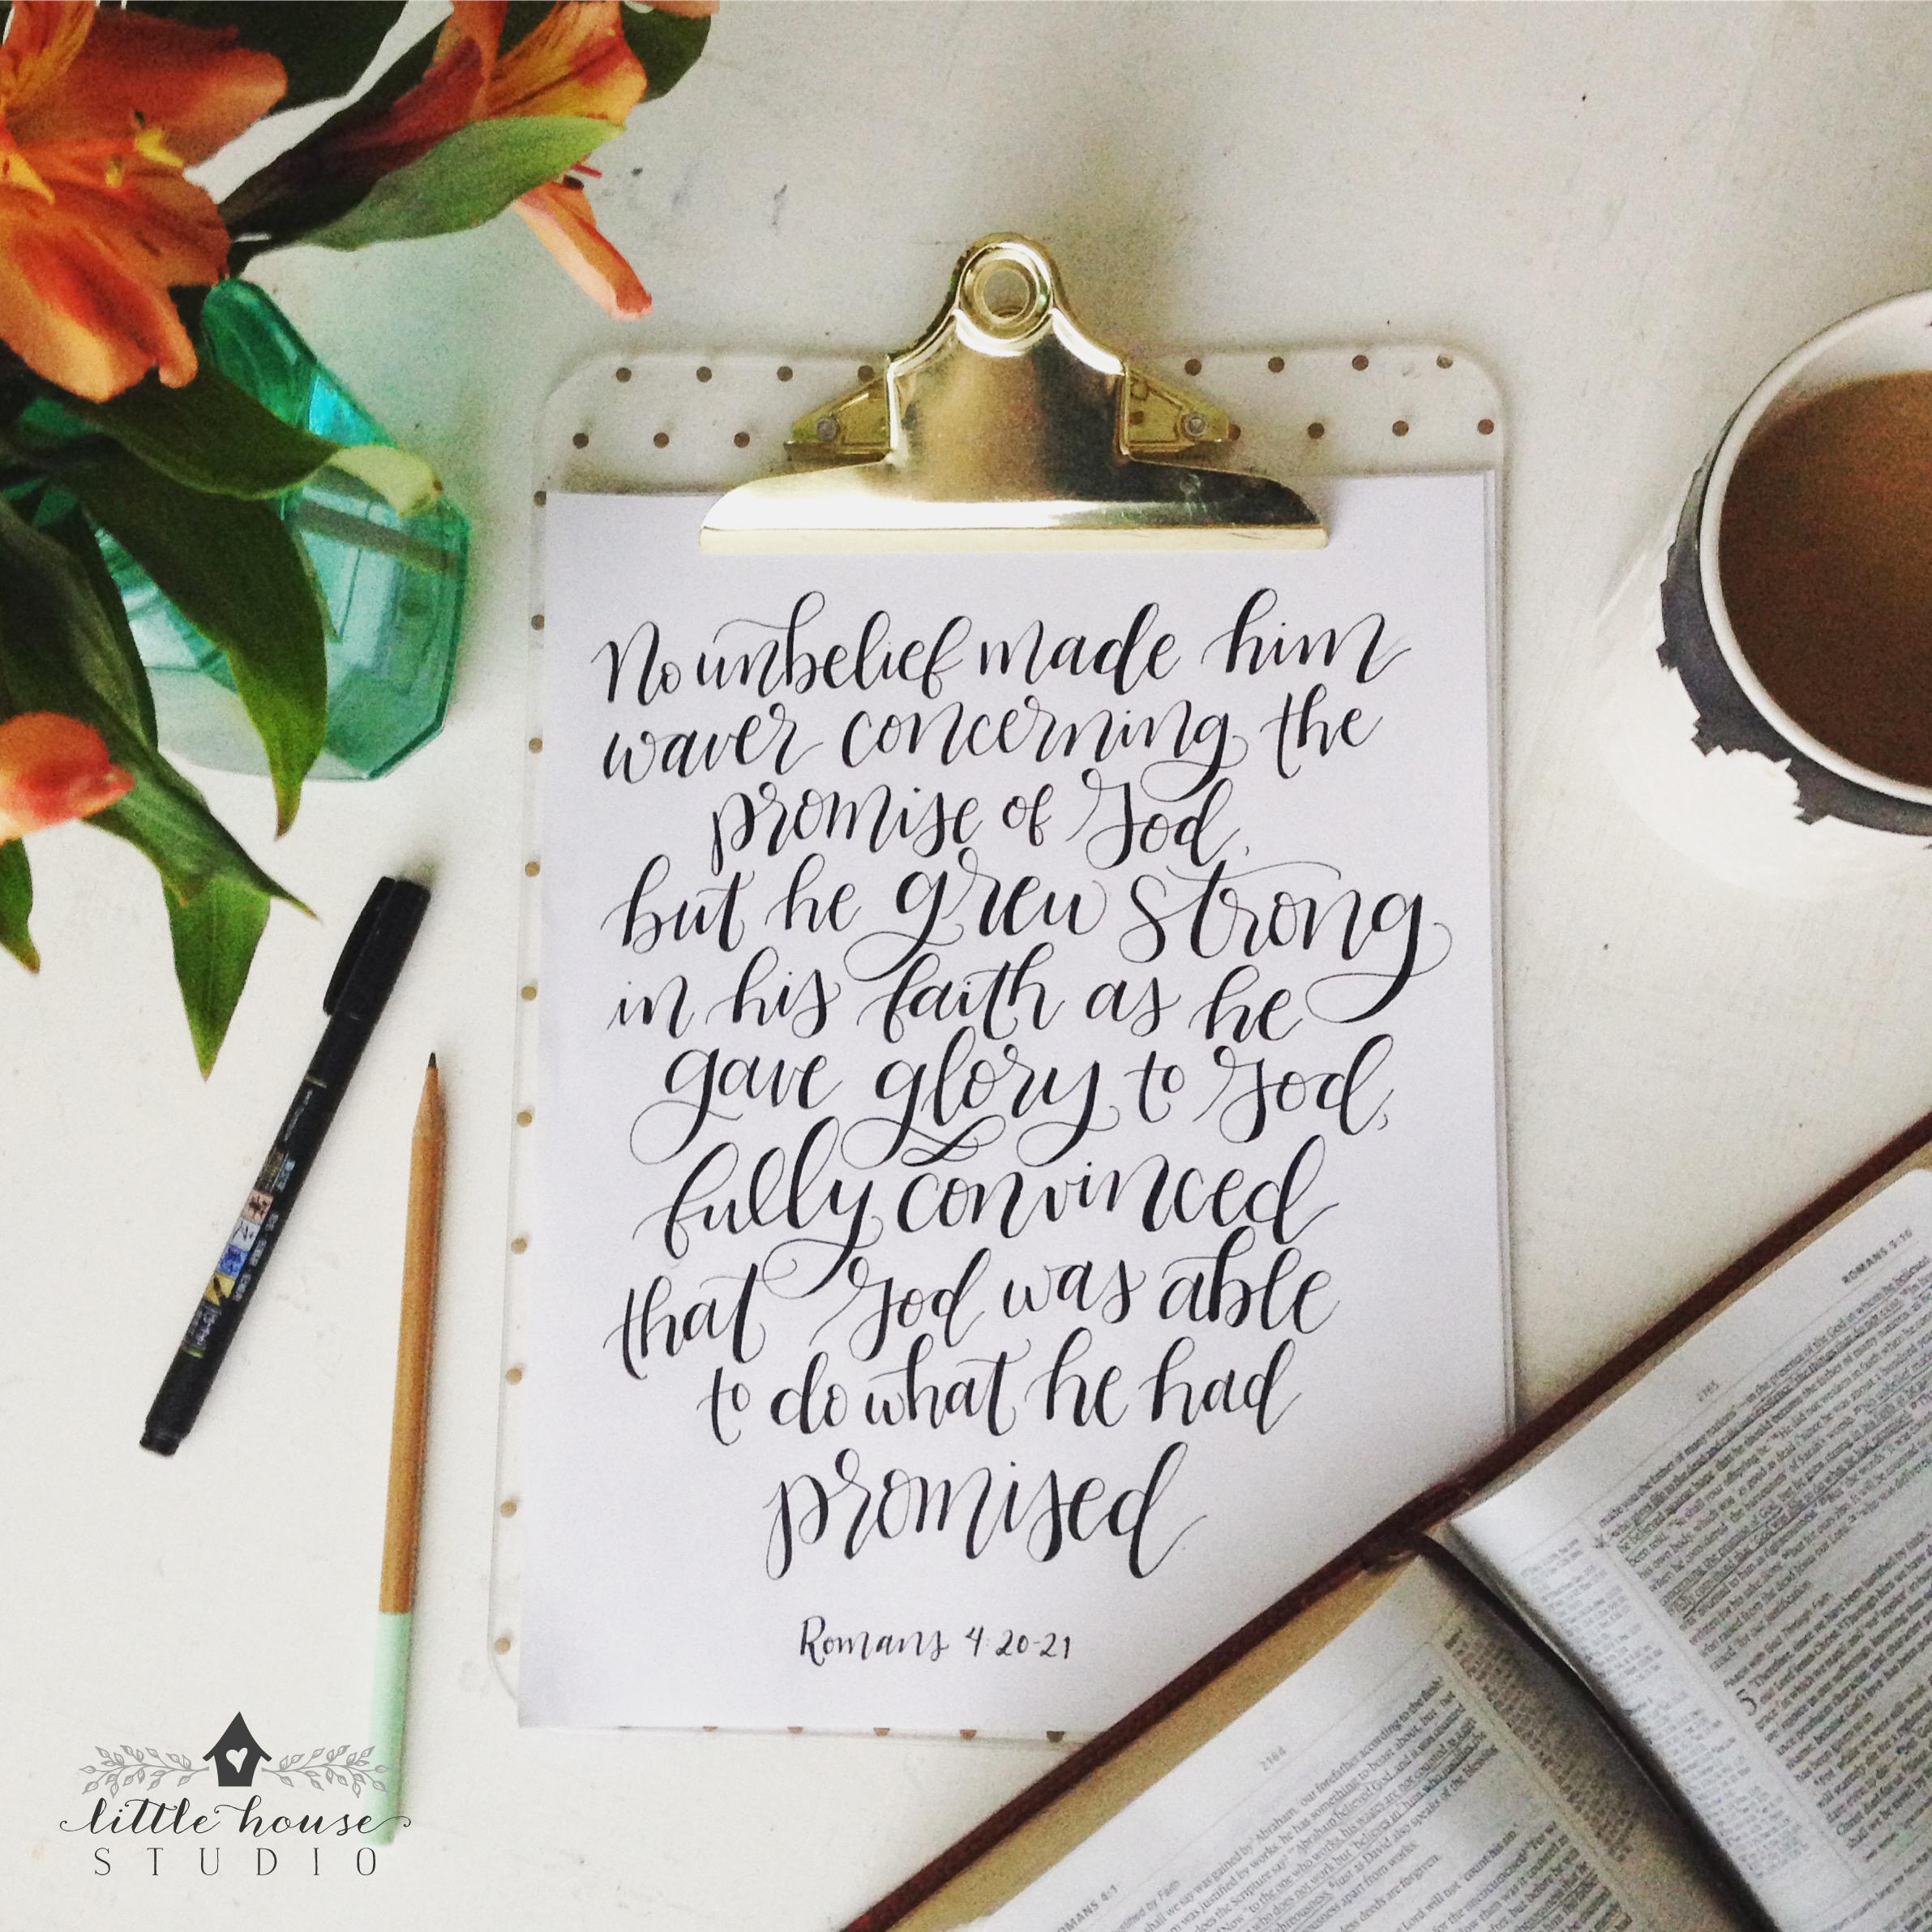 The Faith of Abraham || Romans 4:20-21 || Free Printable || Little House Studio